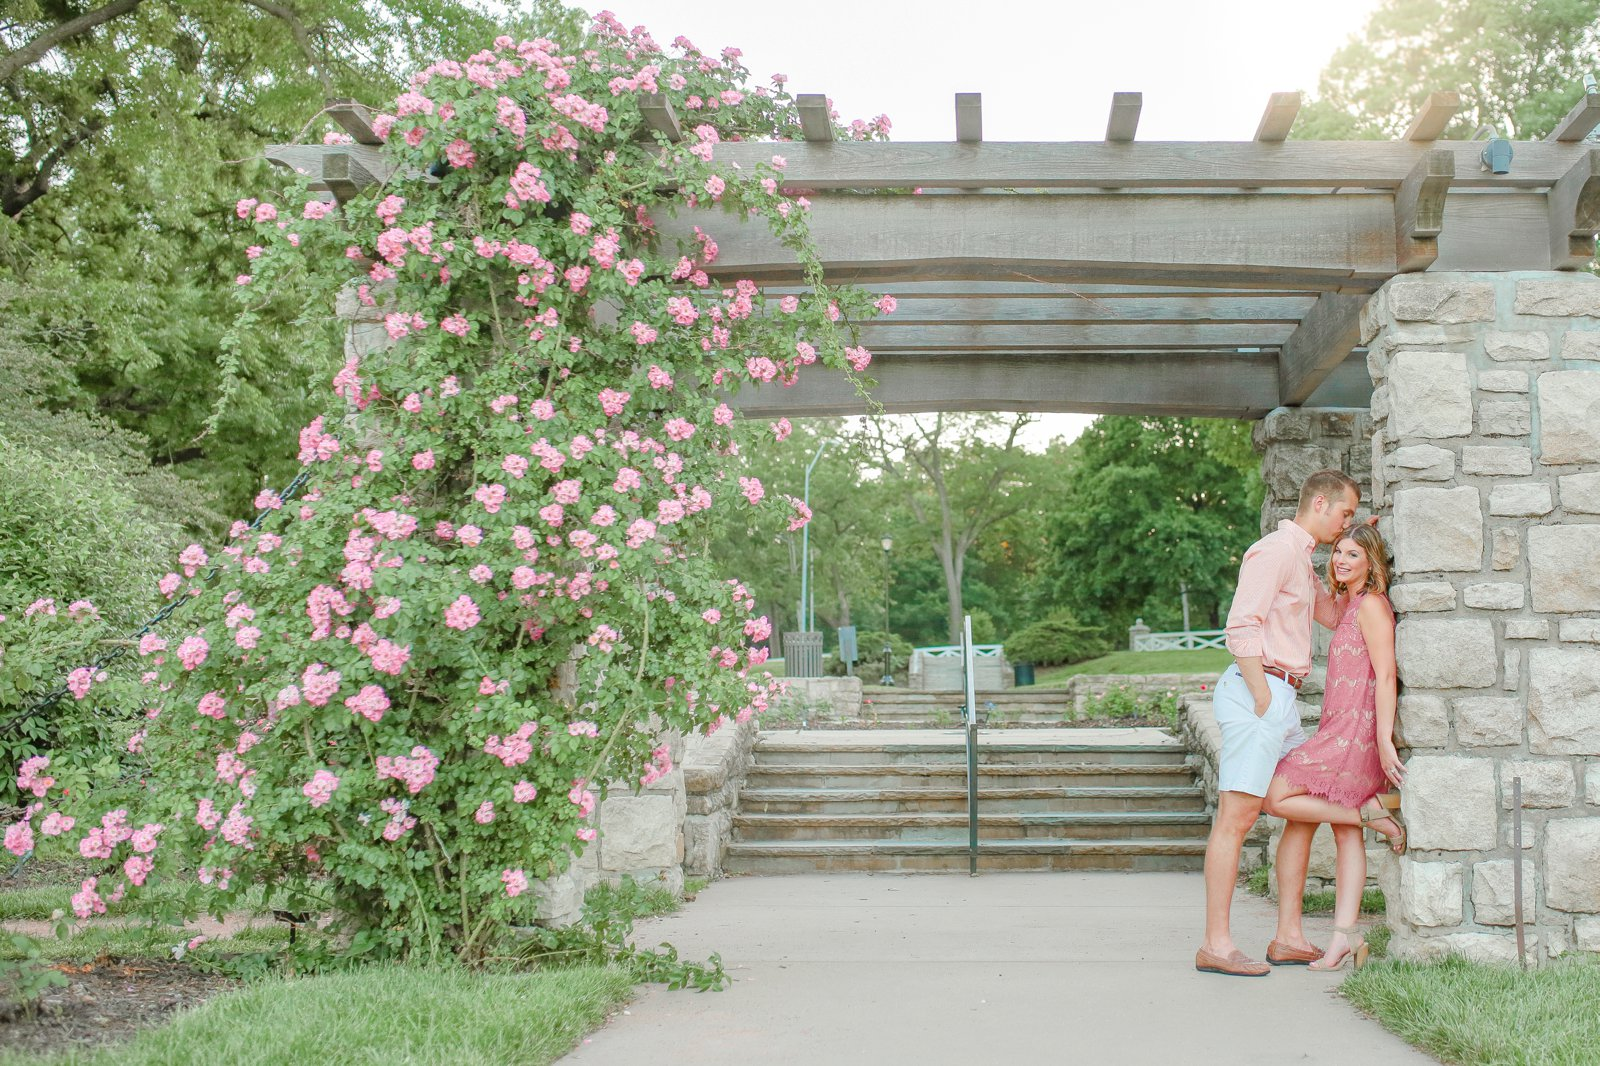 wedding_photographer_Missouri_Destination_elope_intimate_Saint_James_MO_Missouri_KansasCity_Jeff_City_Jefferson_Columbia_Engagement_Photos_Pictures_Session_Best_Videographer_0383.jpg